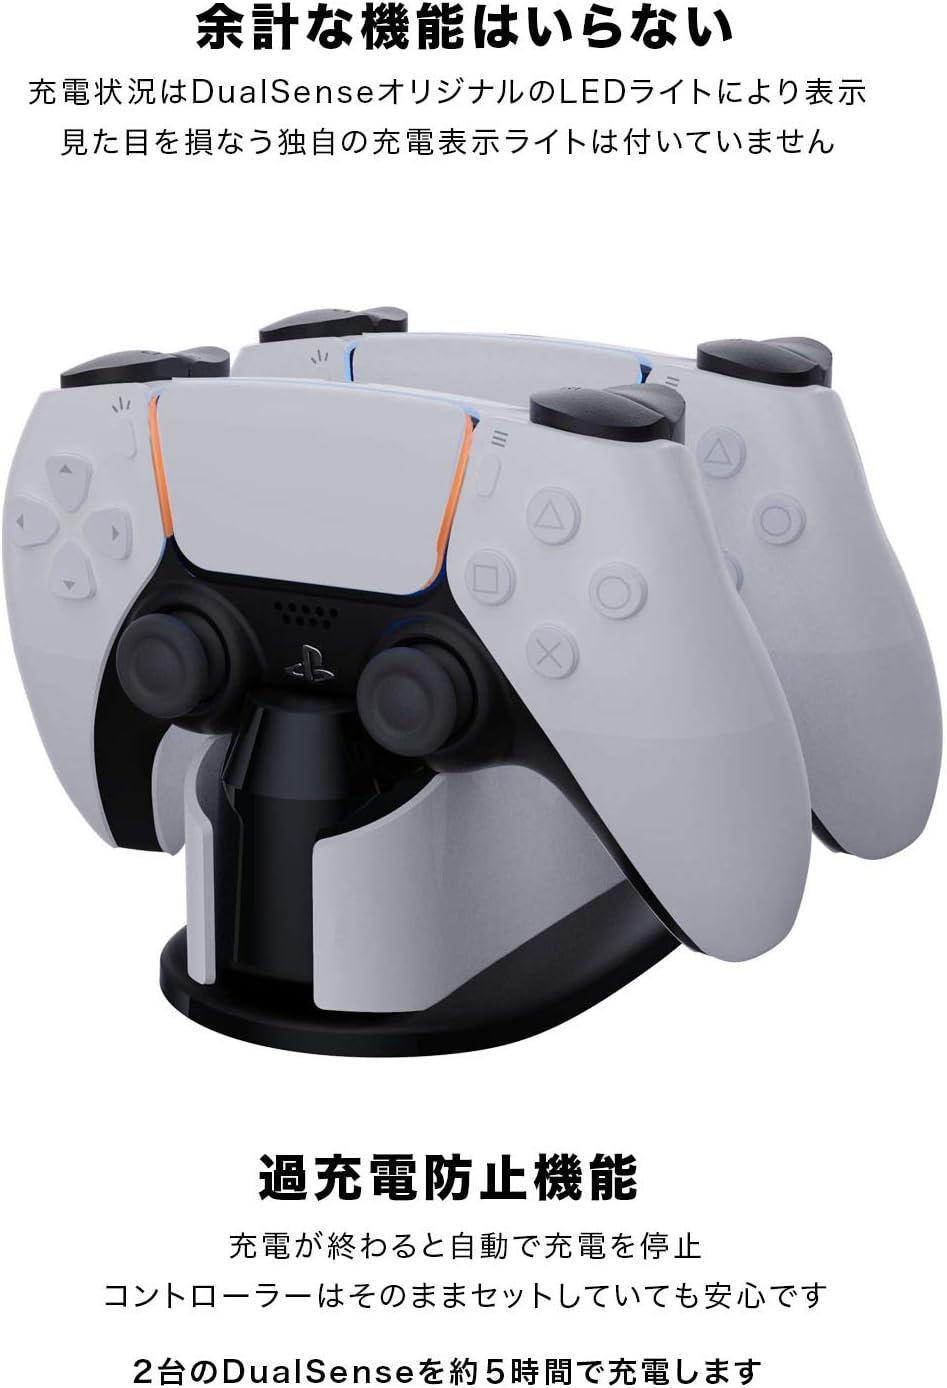 DualSense PS5 ワイヤレスコントローラー 充電スタンド